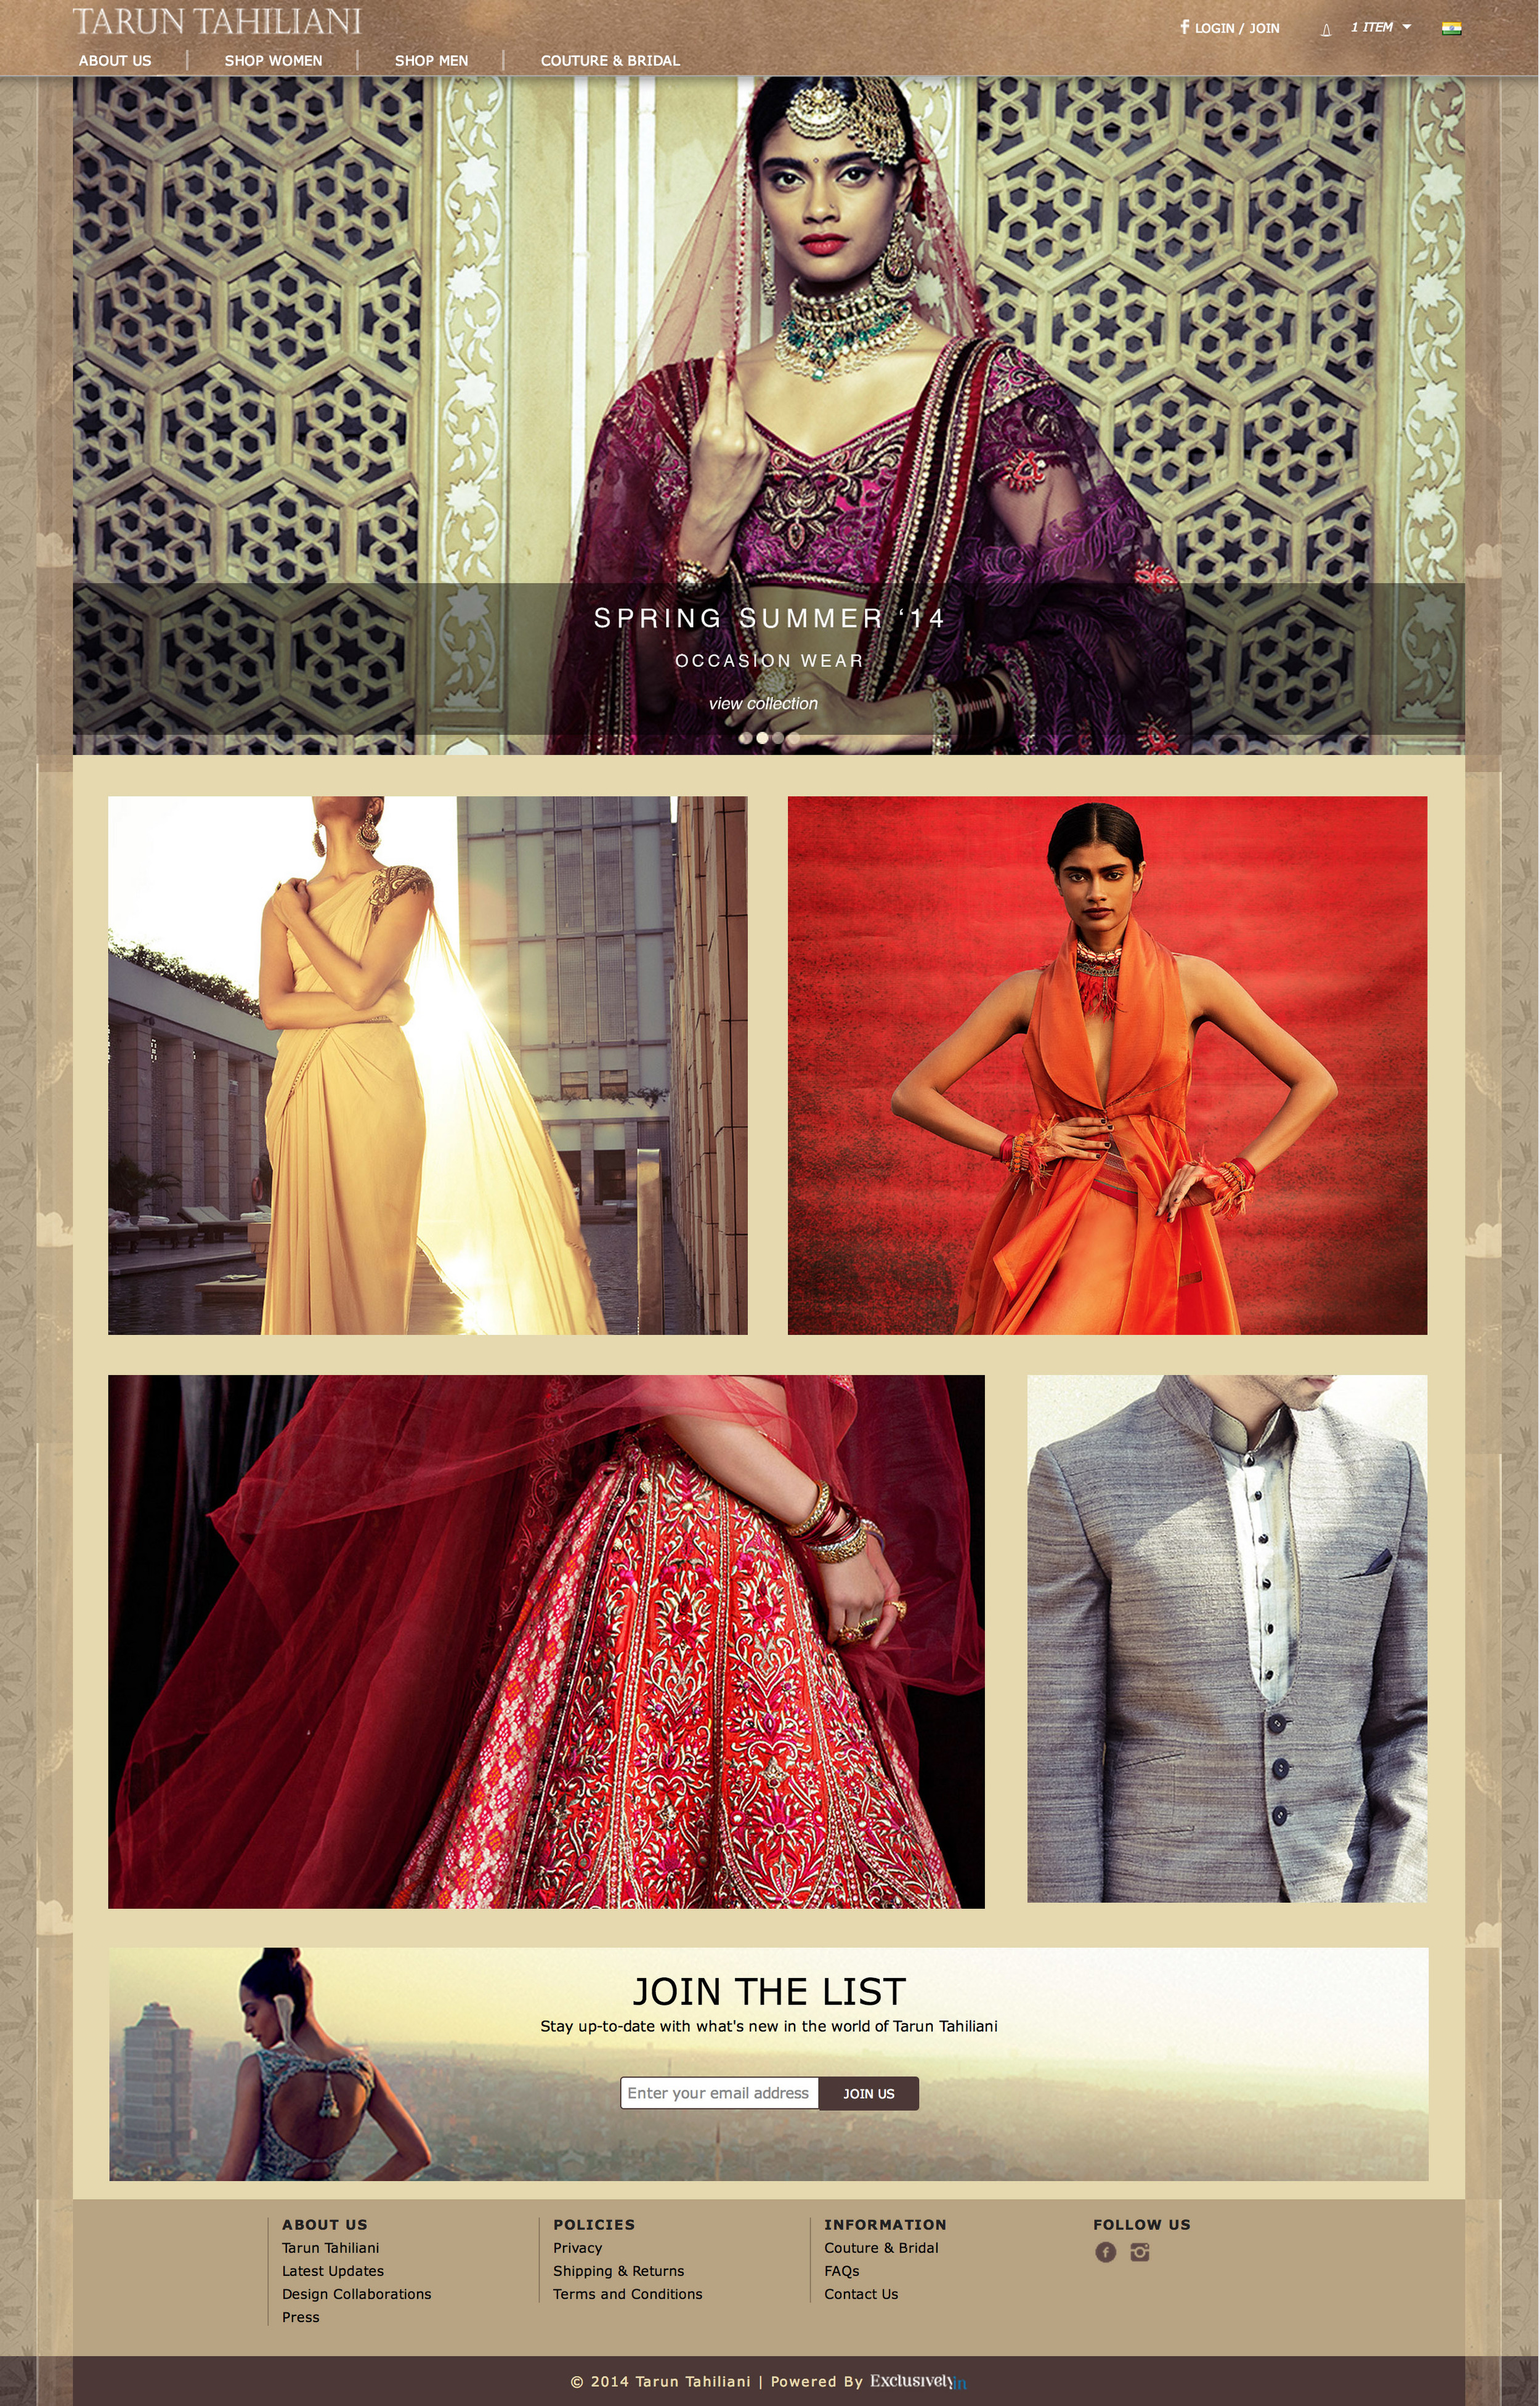 Tarun Tahiliani - Homepage.jpg